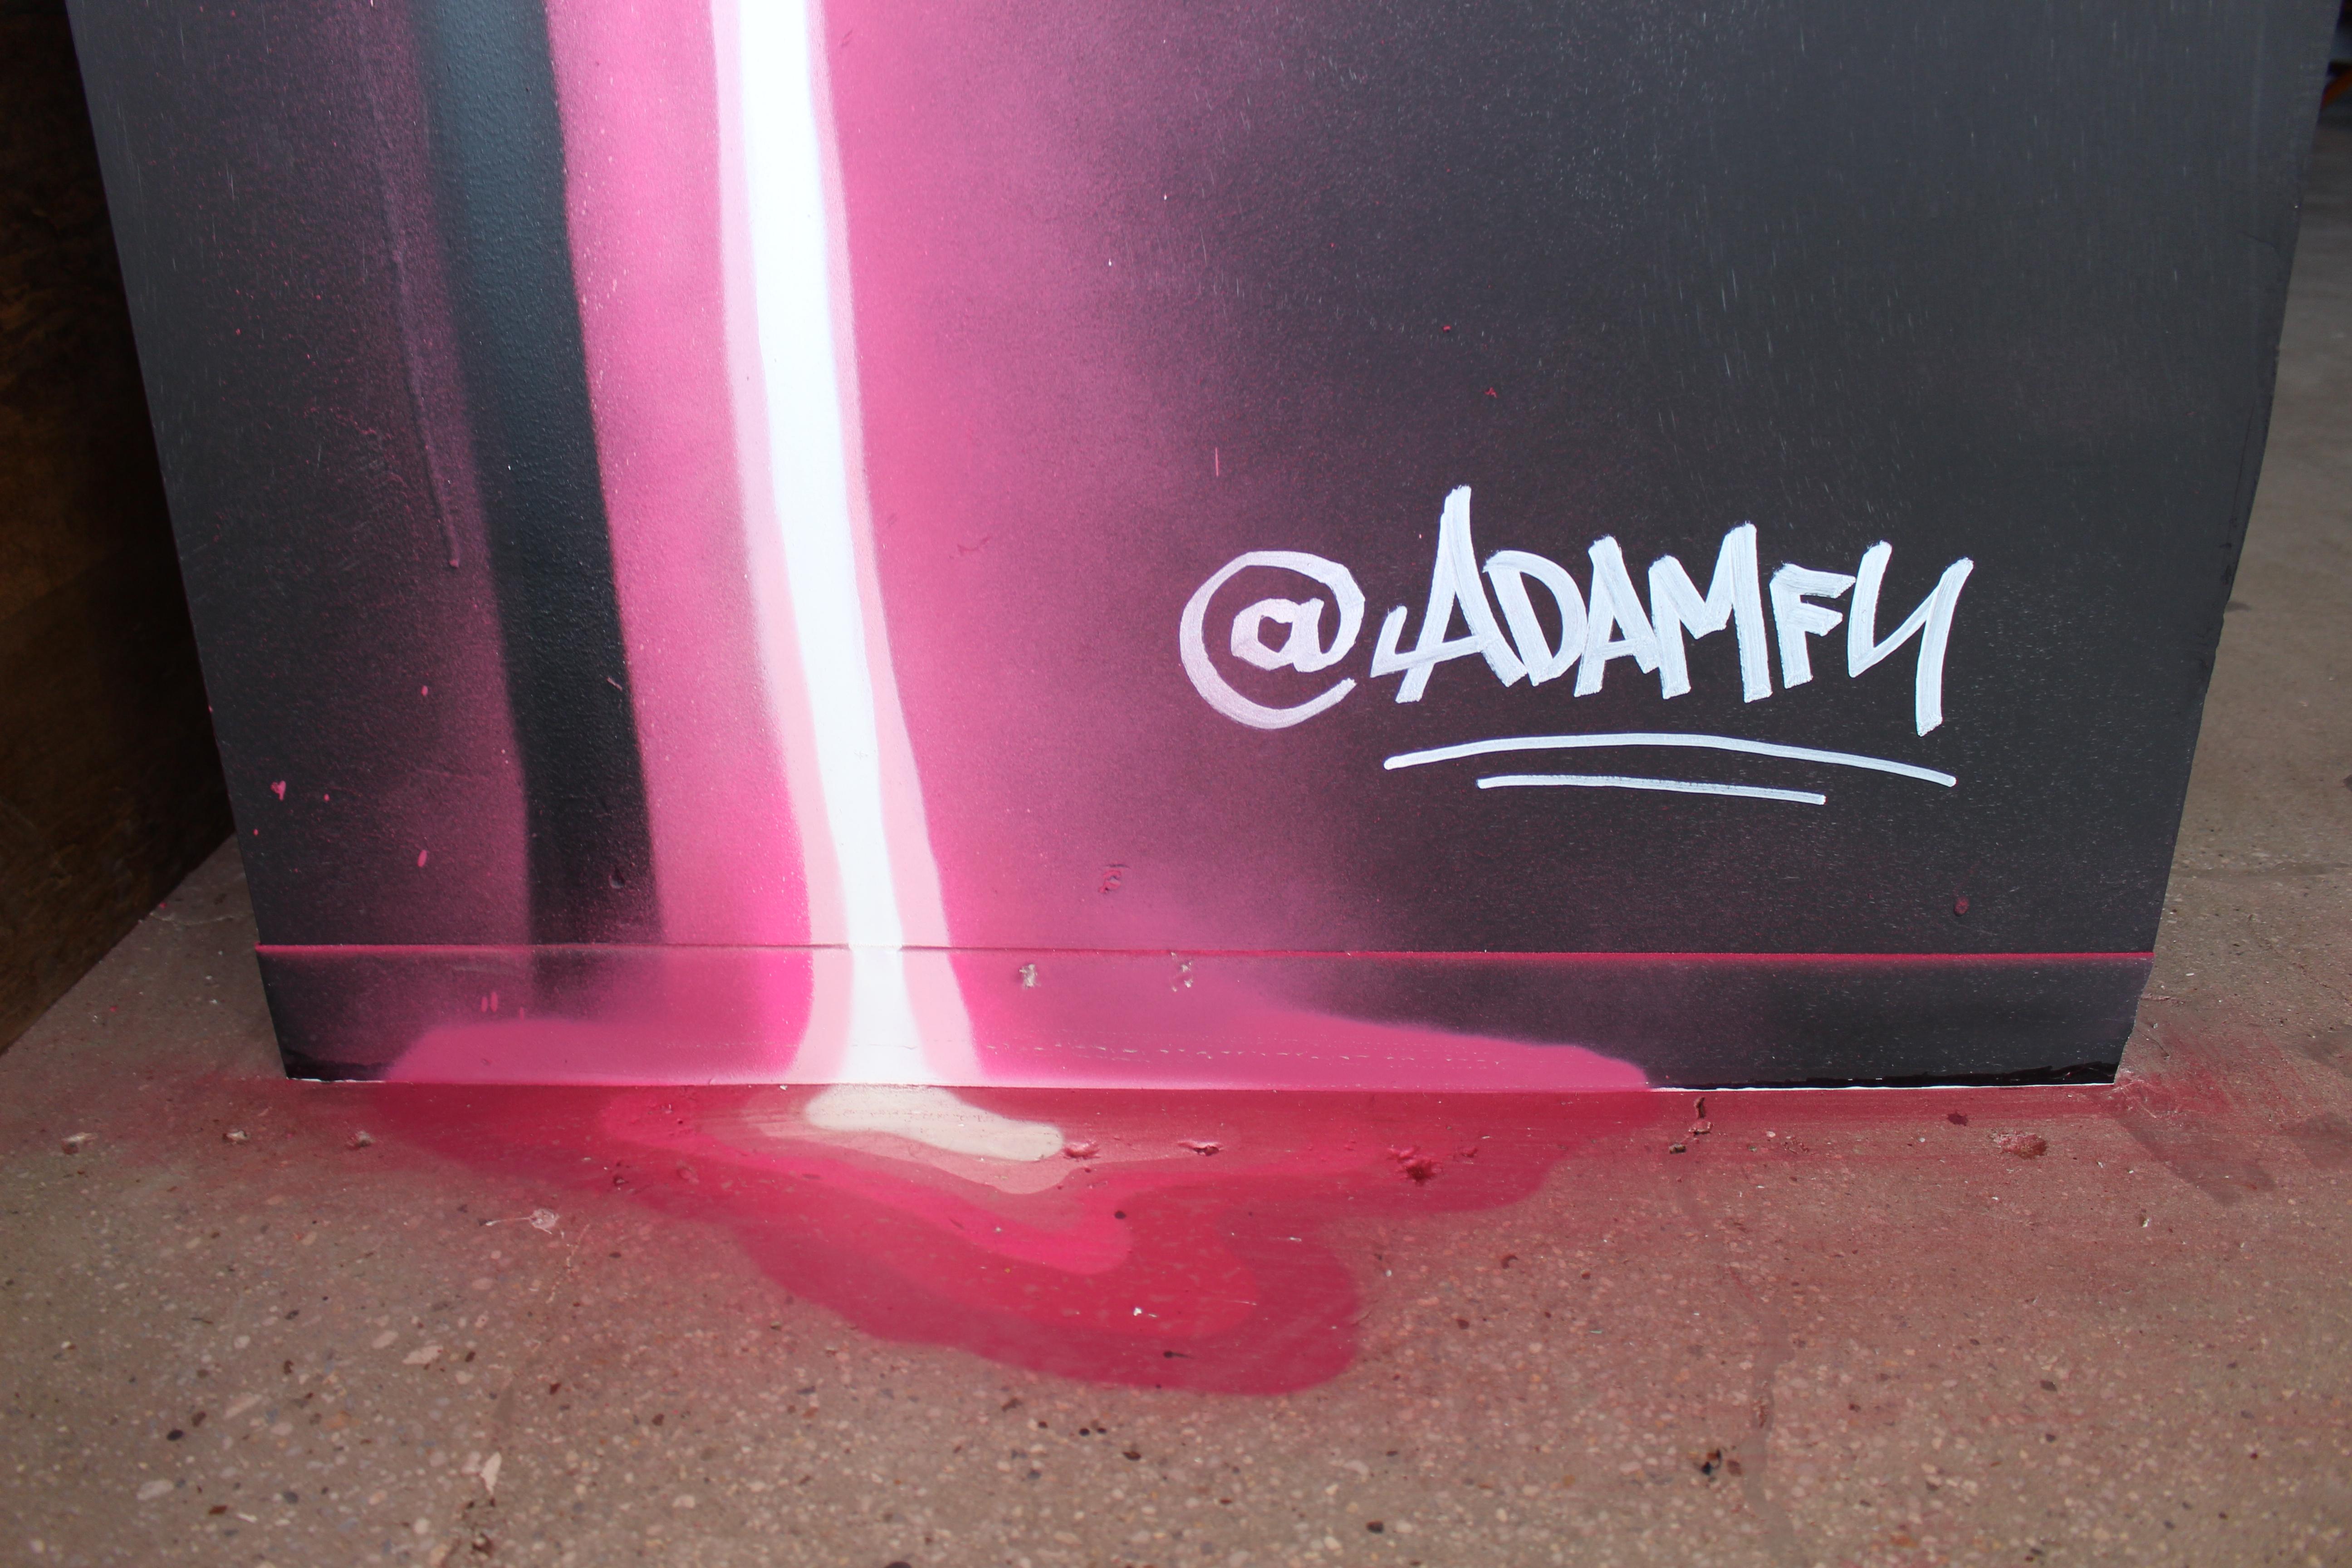 Adam Fujita